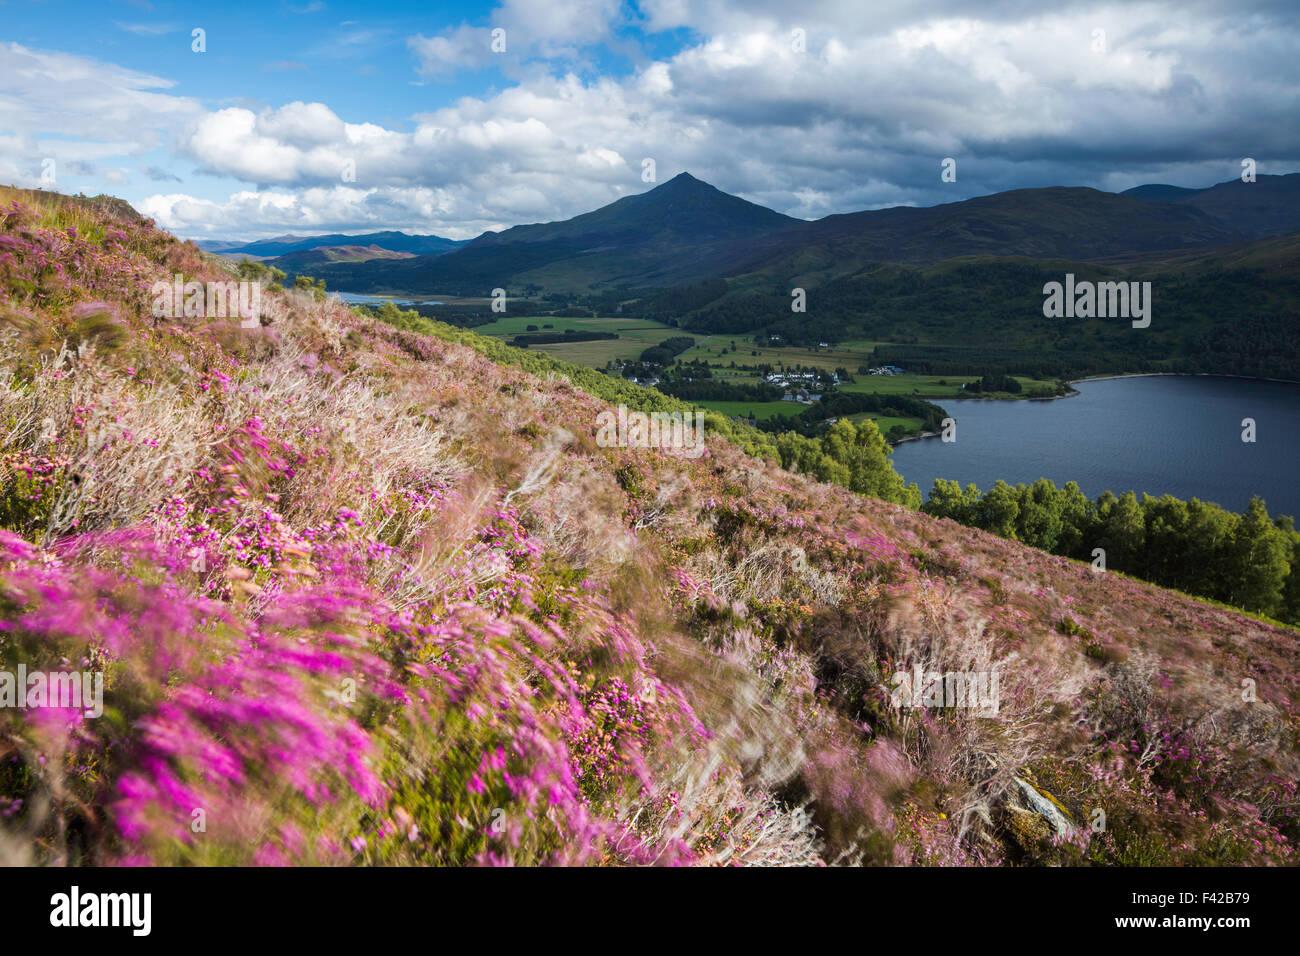 heather on the hillside above Loch Rannoch with Schiehallion beyond, Perth & Kinross, Scotland, UK - Stock Image